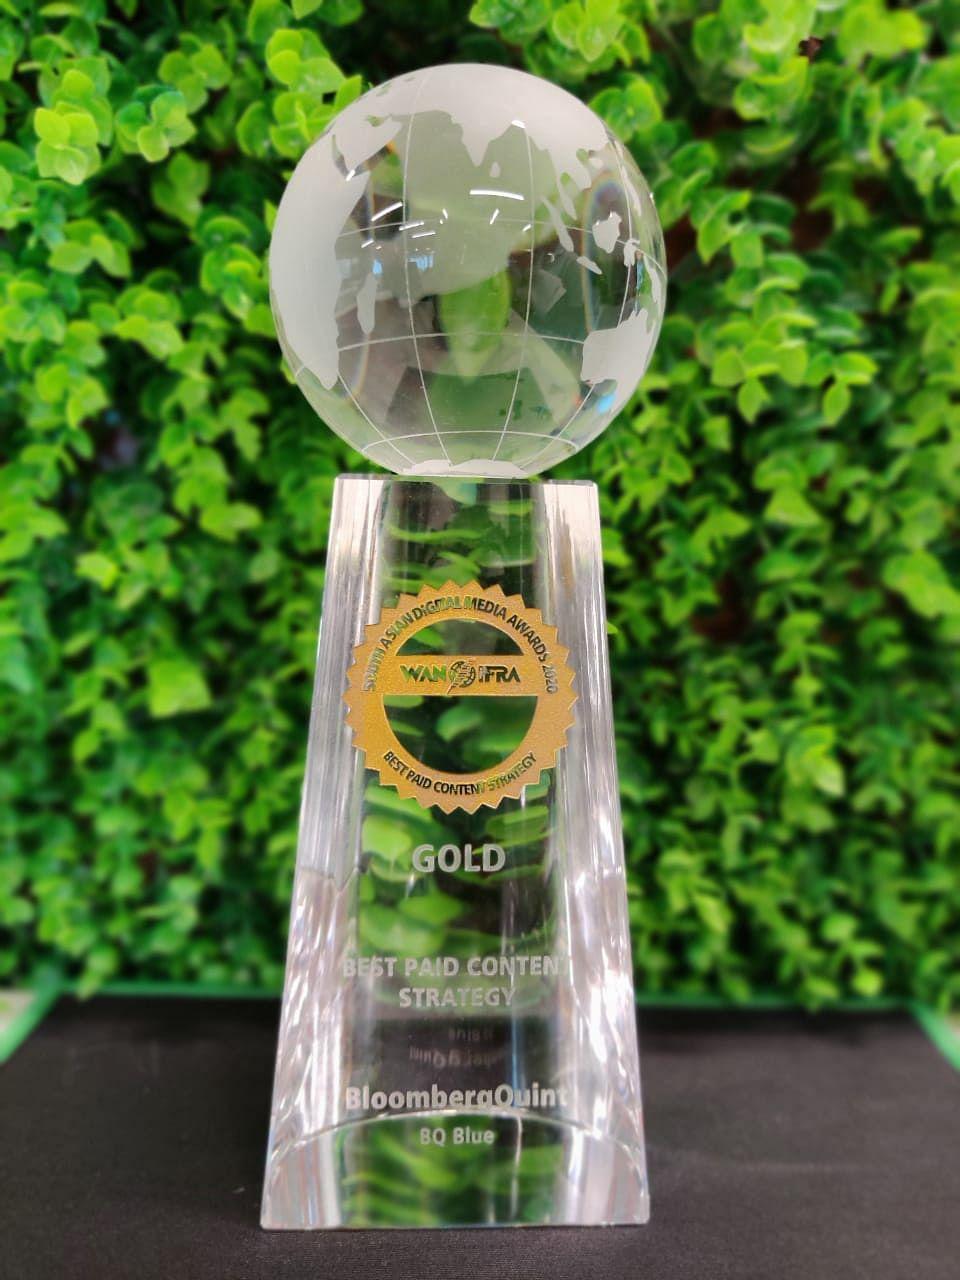 BloombergQuint wins Gold at South Asian Digital Media Awards 2020